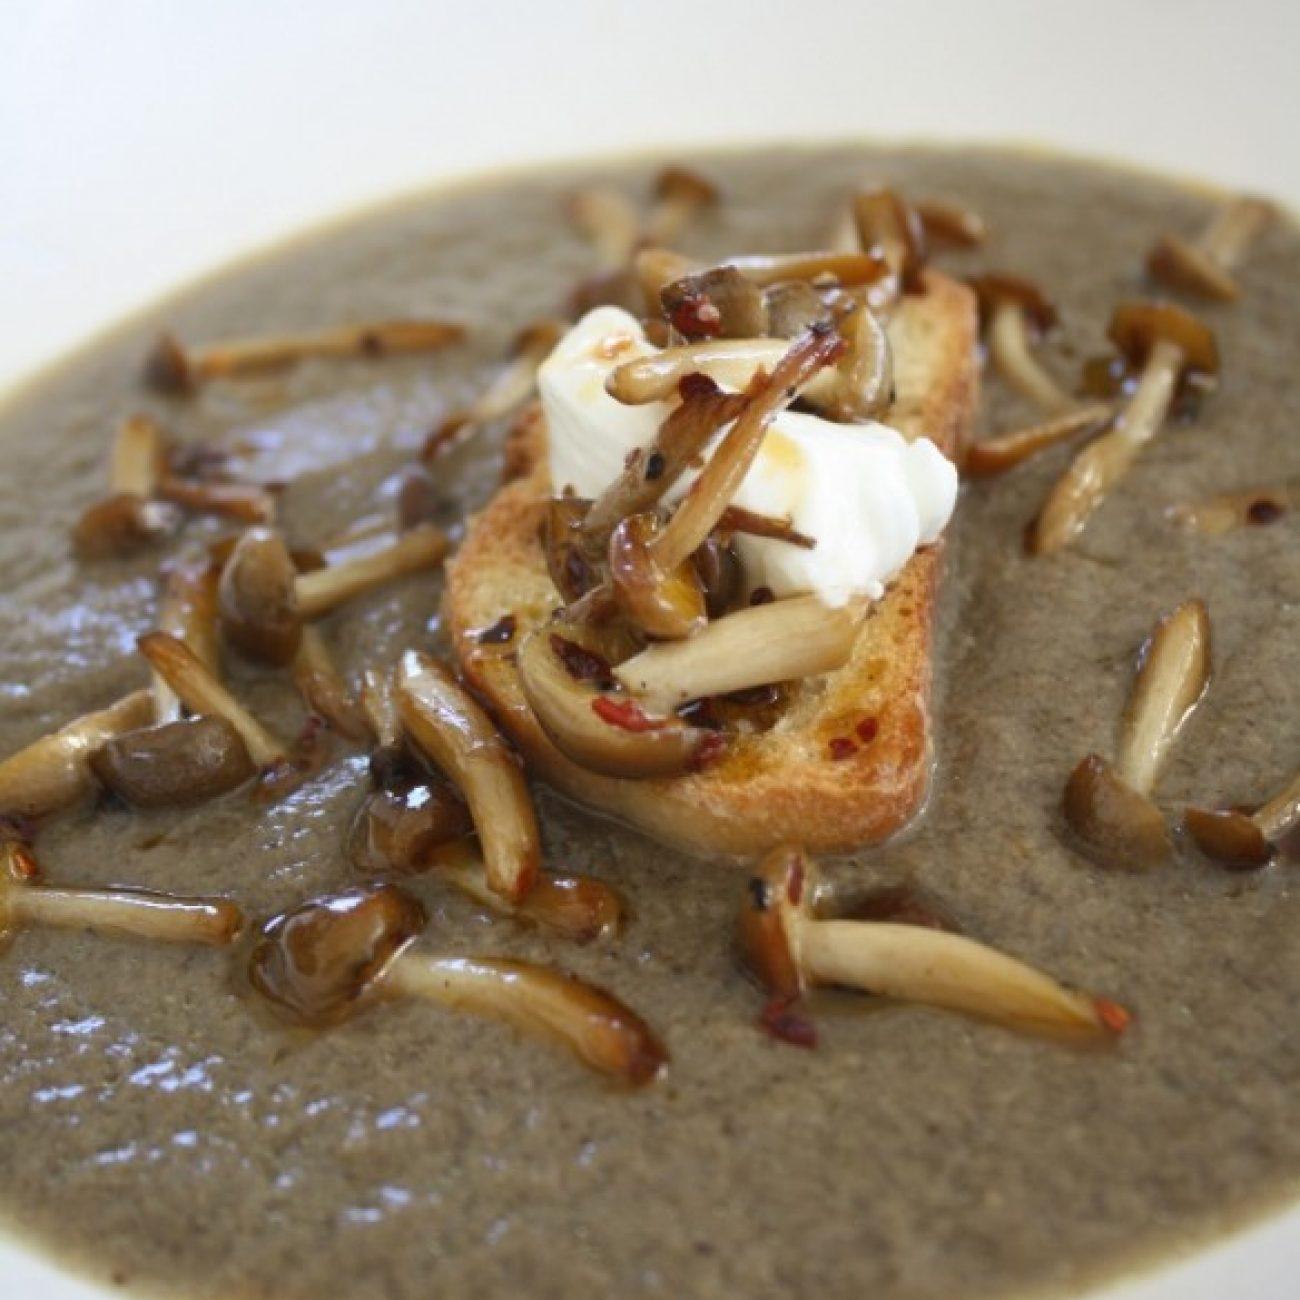 Mushoom Soup with Sauteed Beech Mushrooms